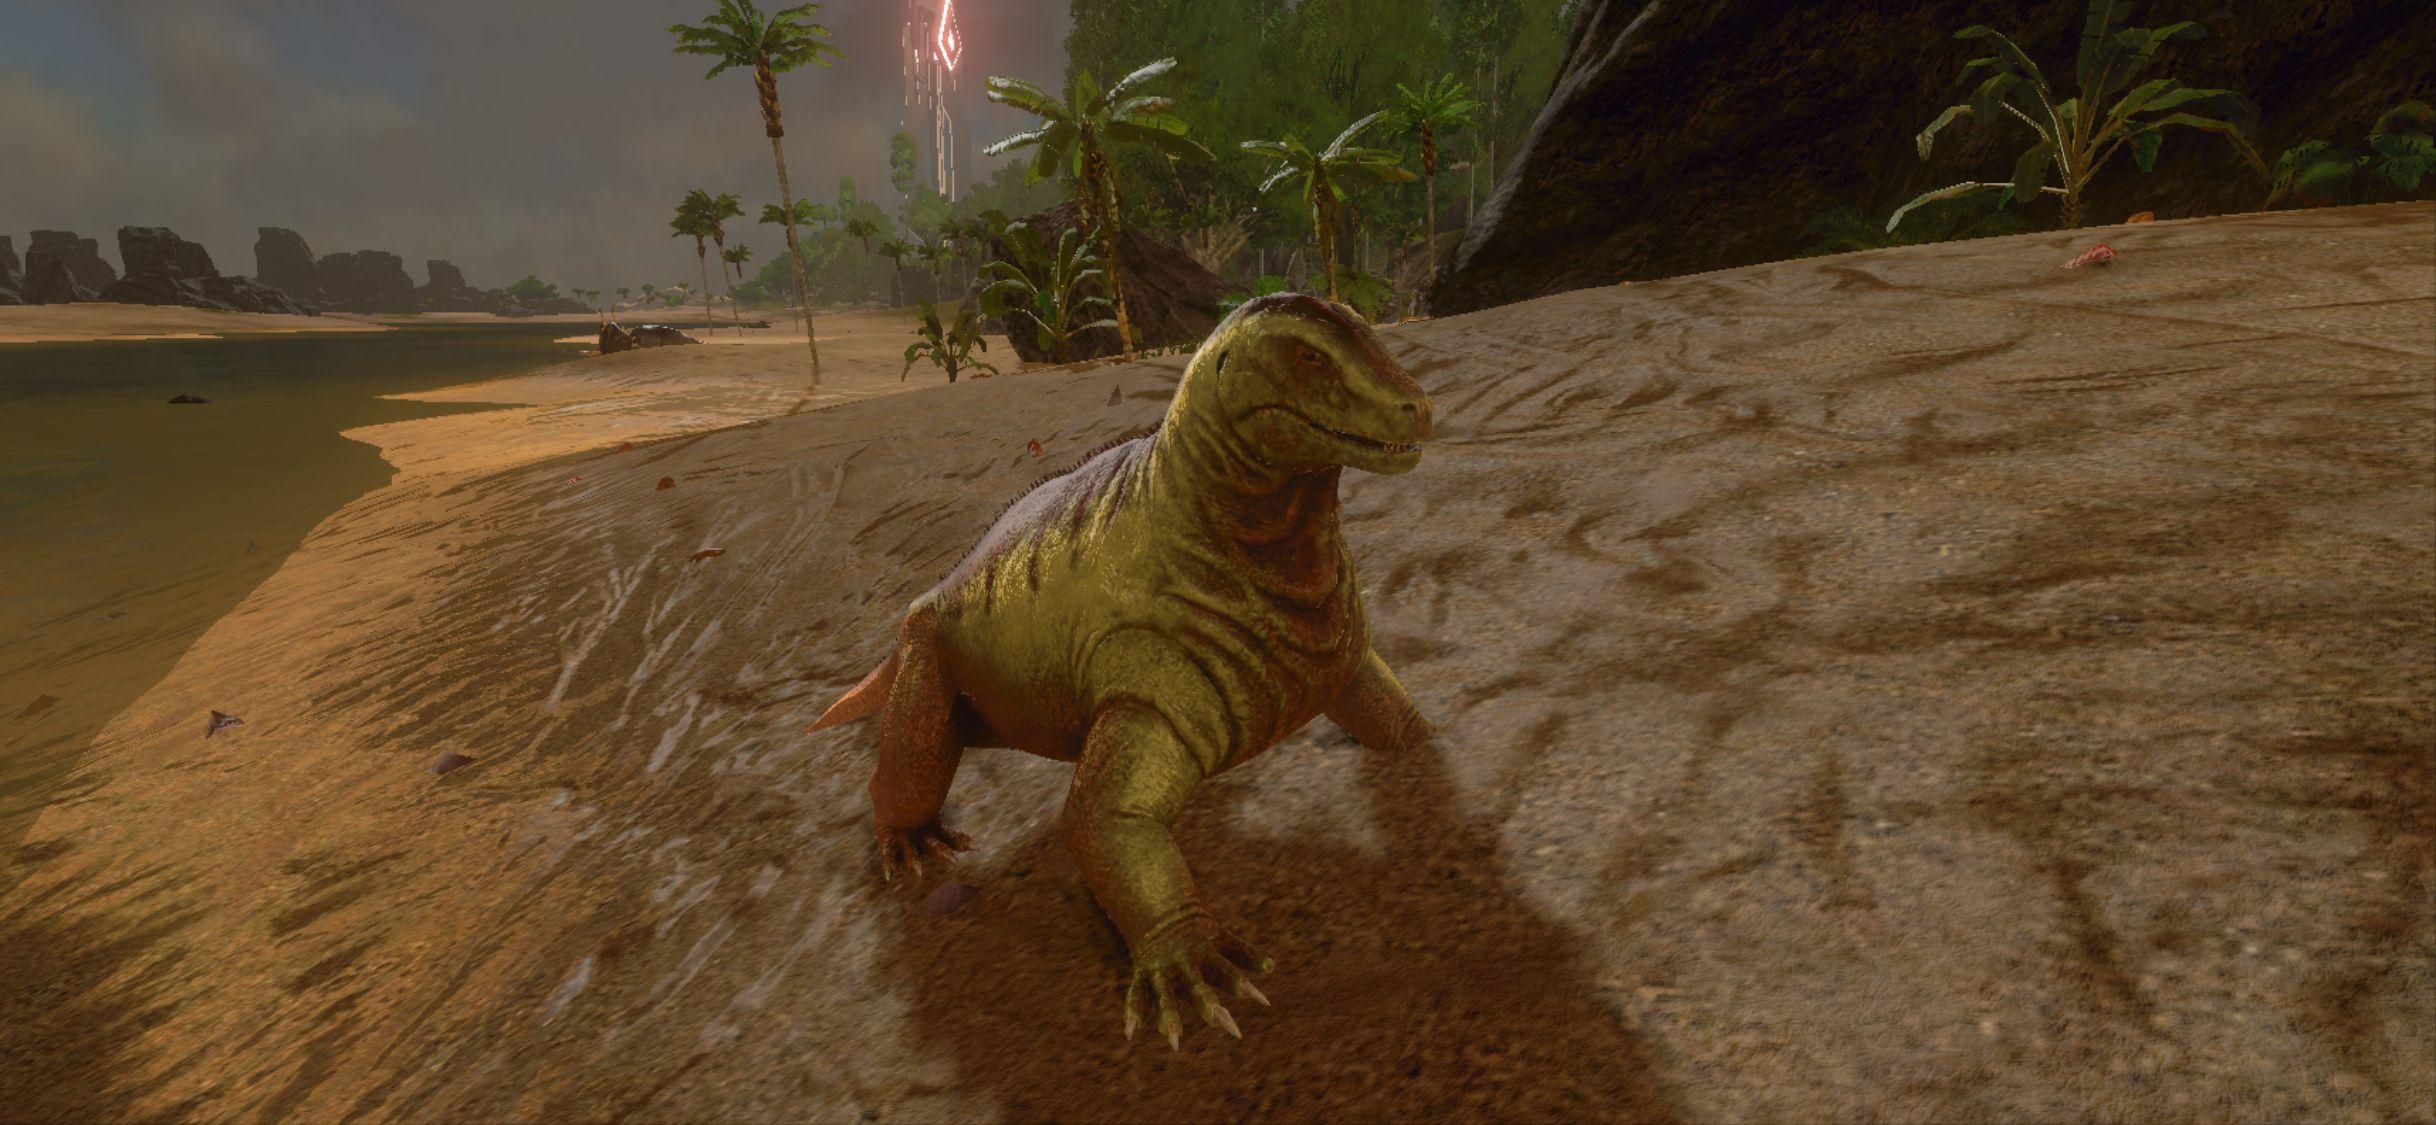 15+ Ark survival evolved animals images